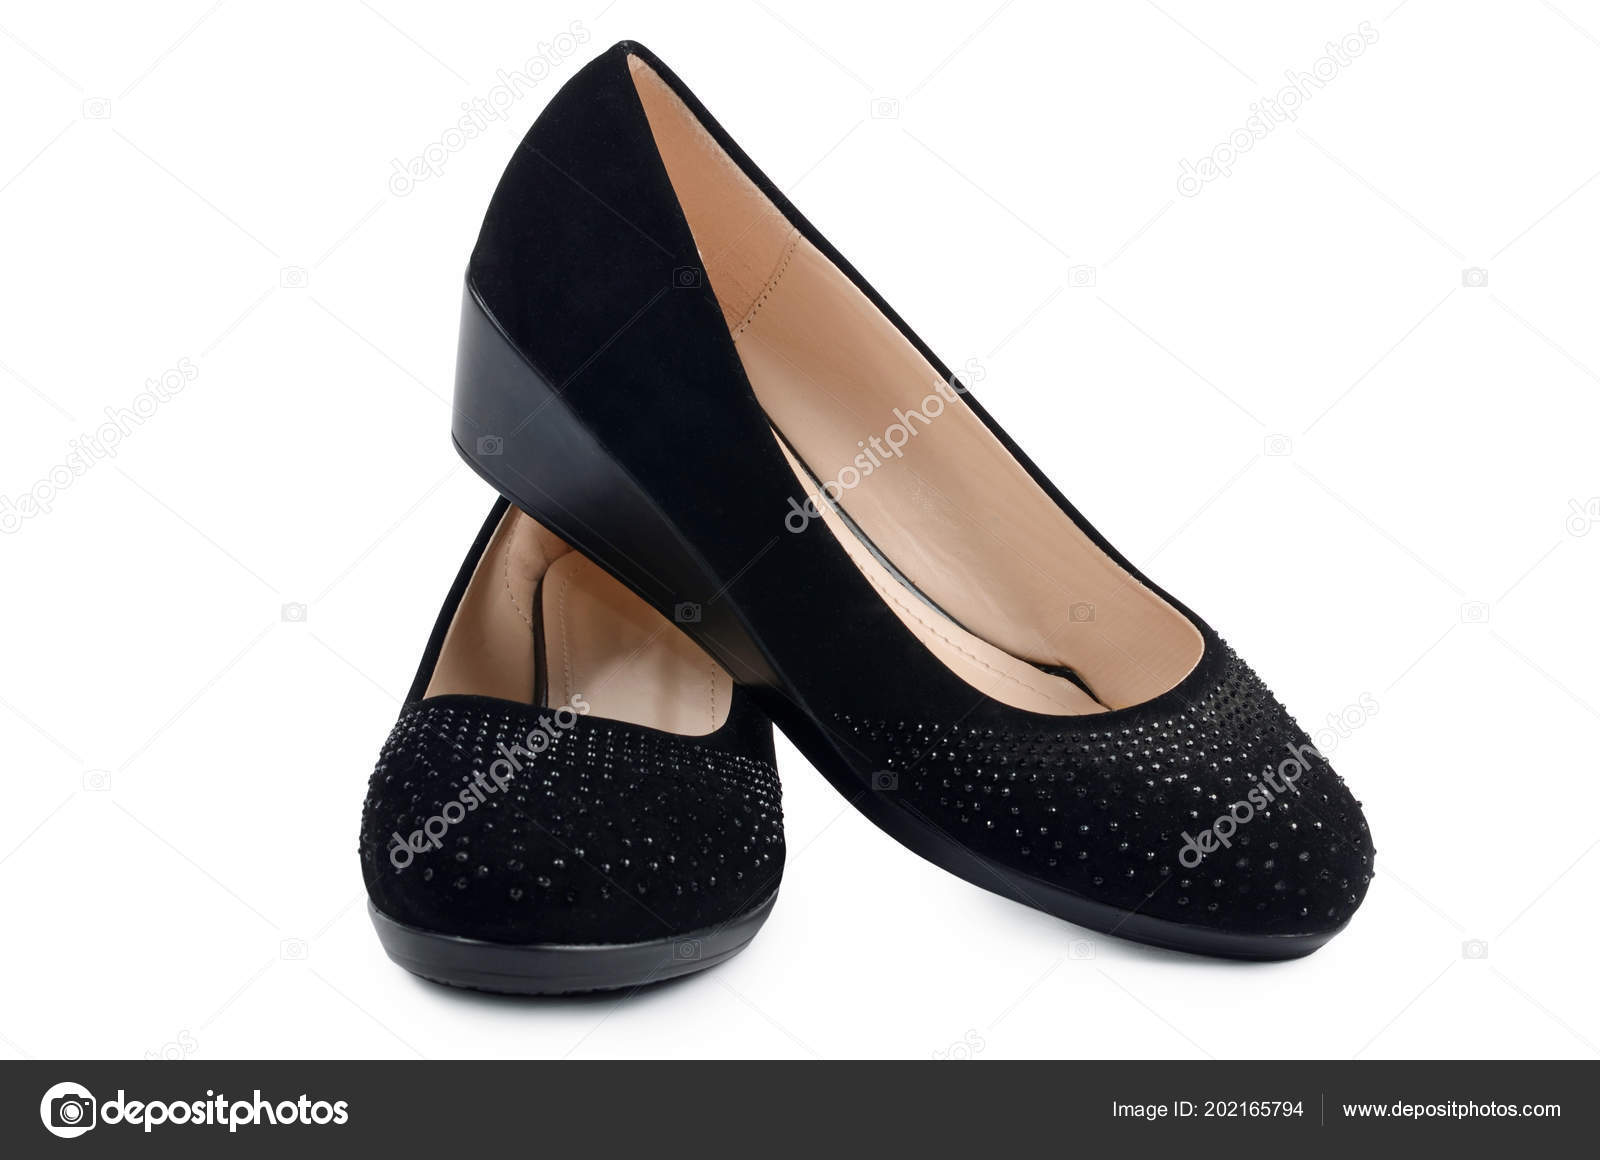 bf8b25e12 Women Black Shoes Isolated White Background — Stock Photo © sveta ...